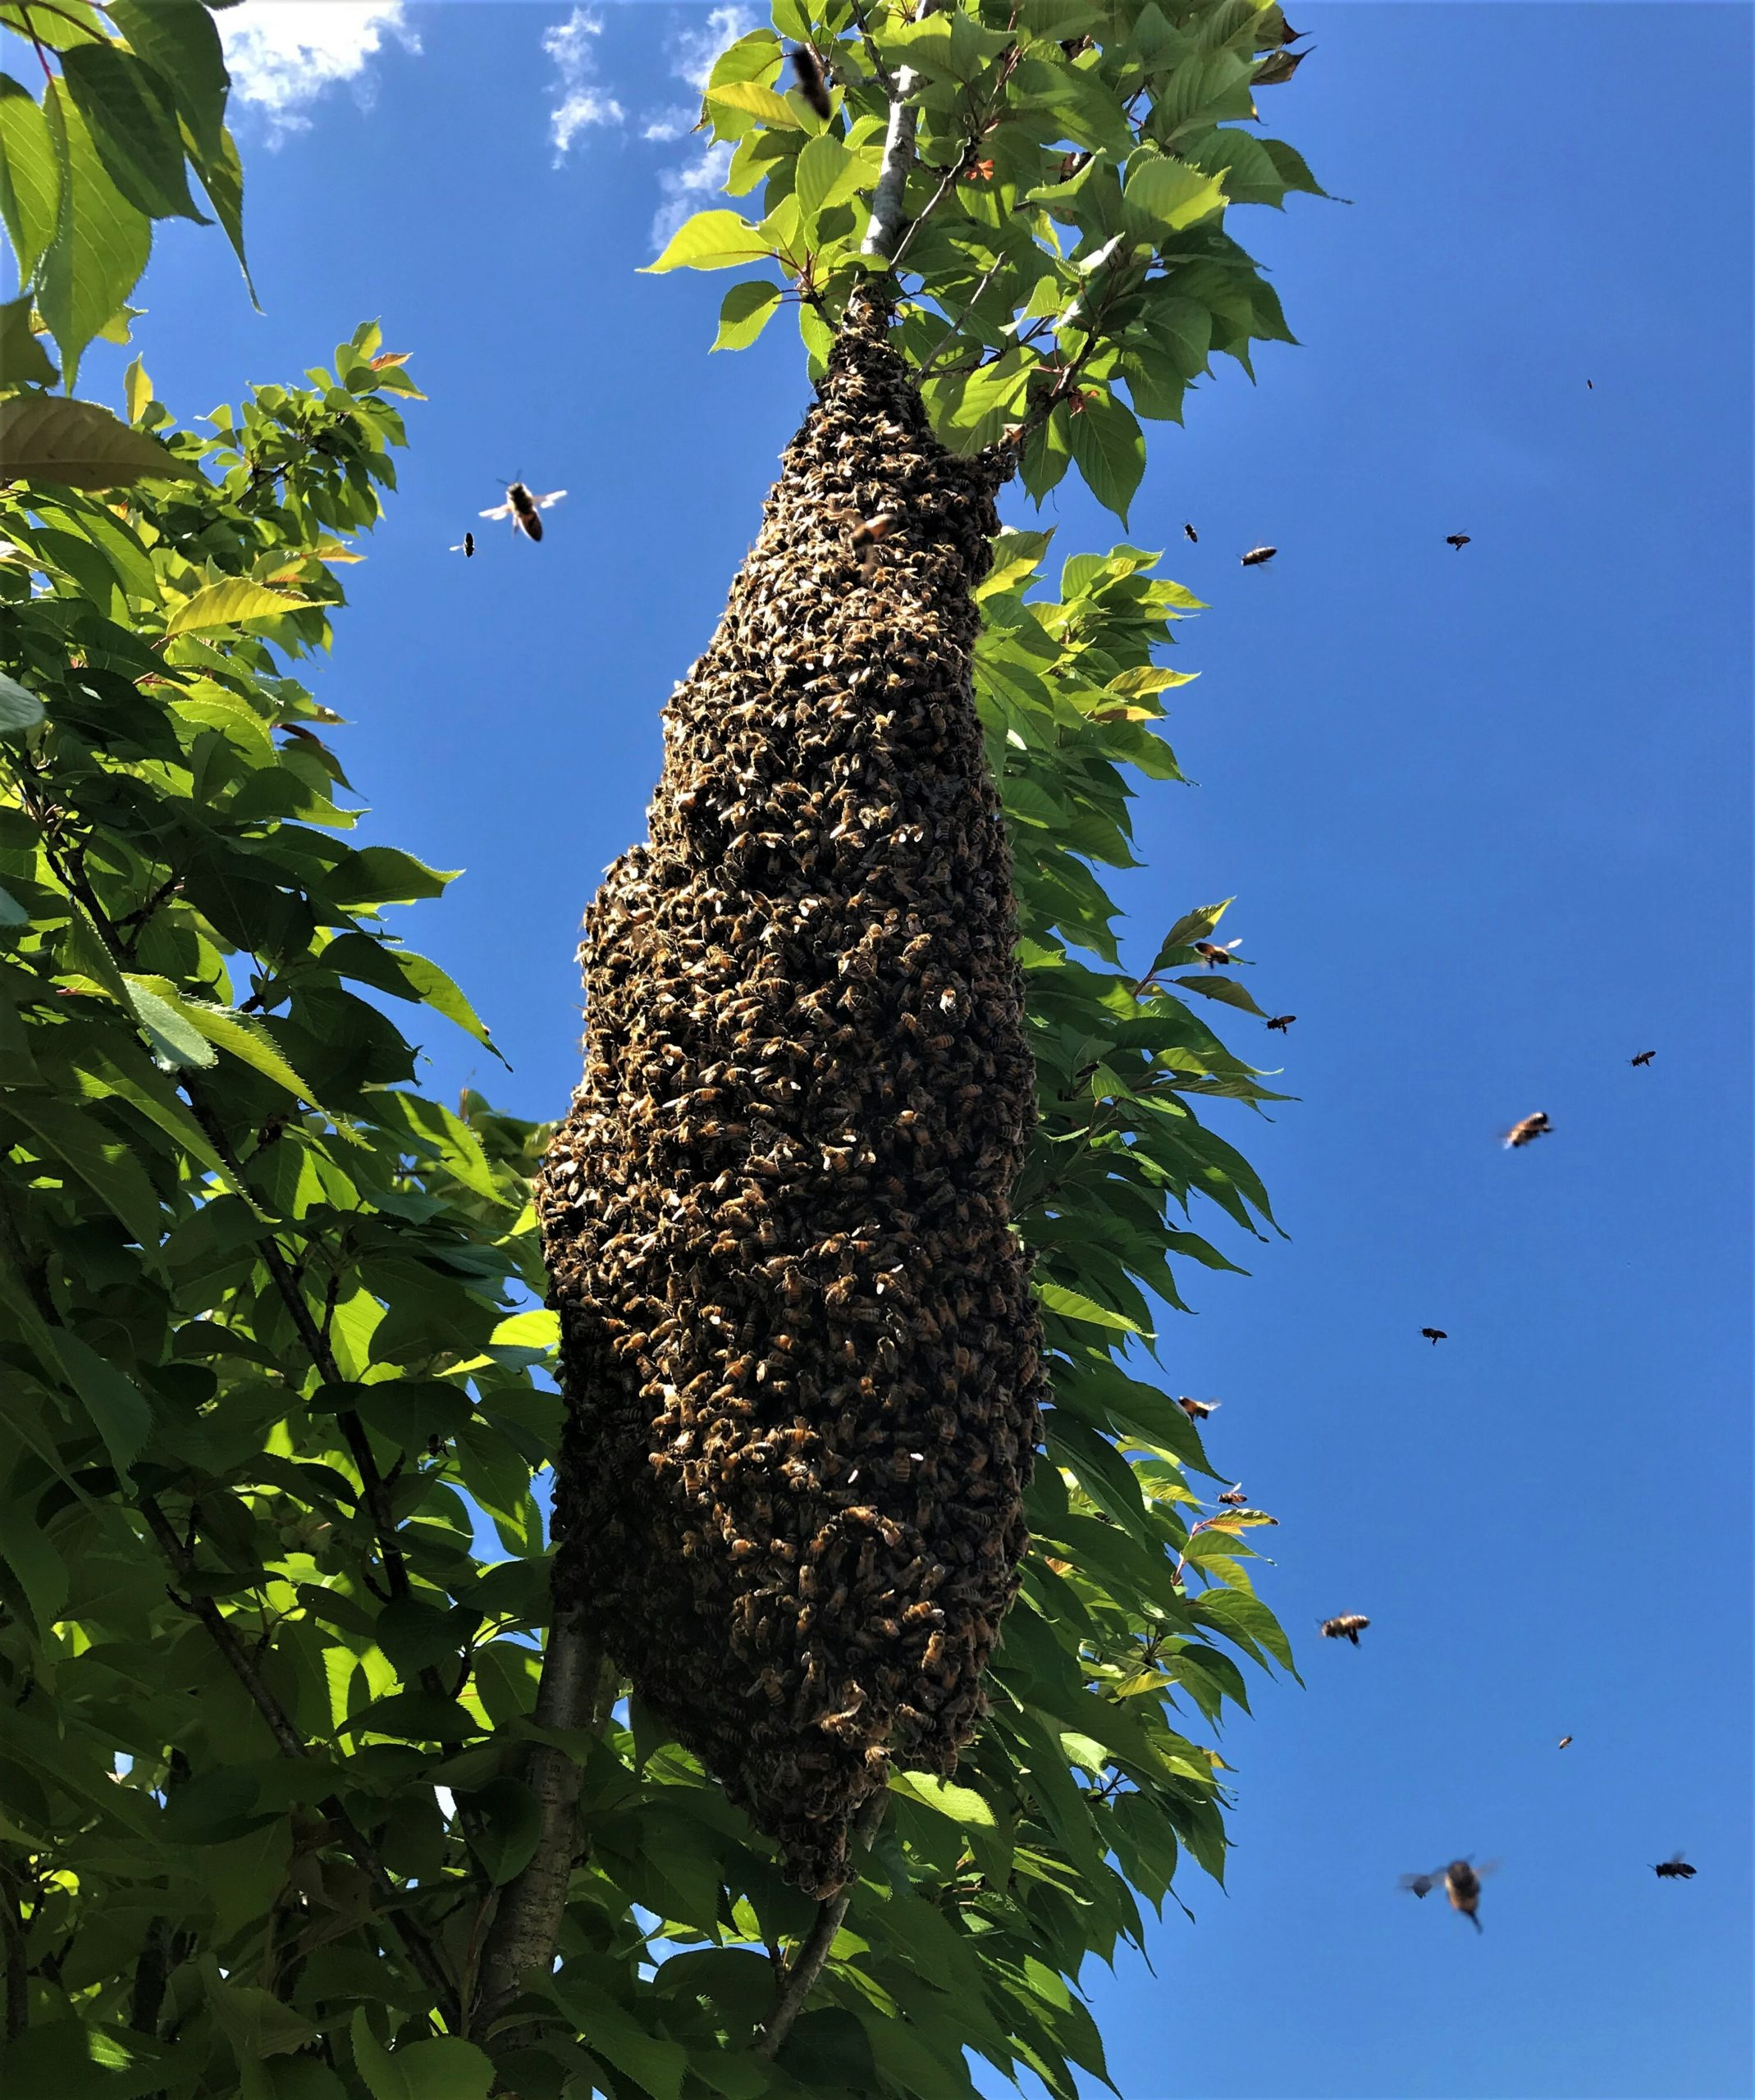 Honeybee swarm.